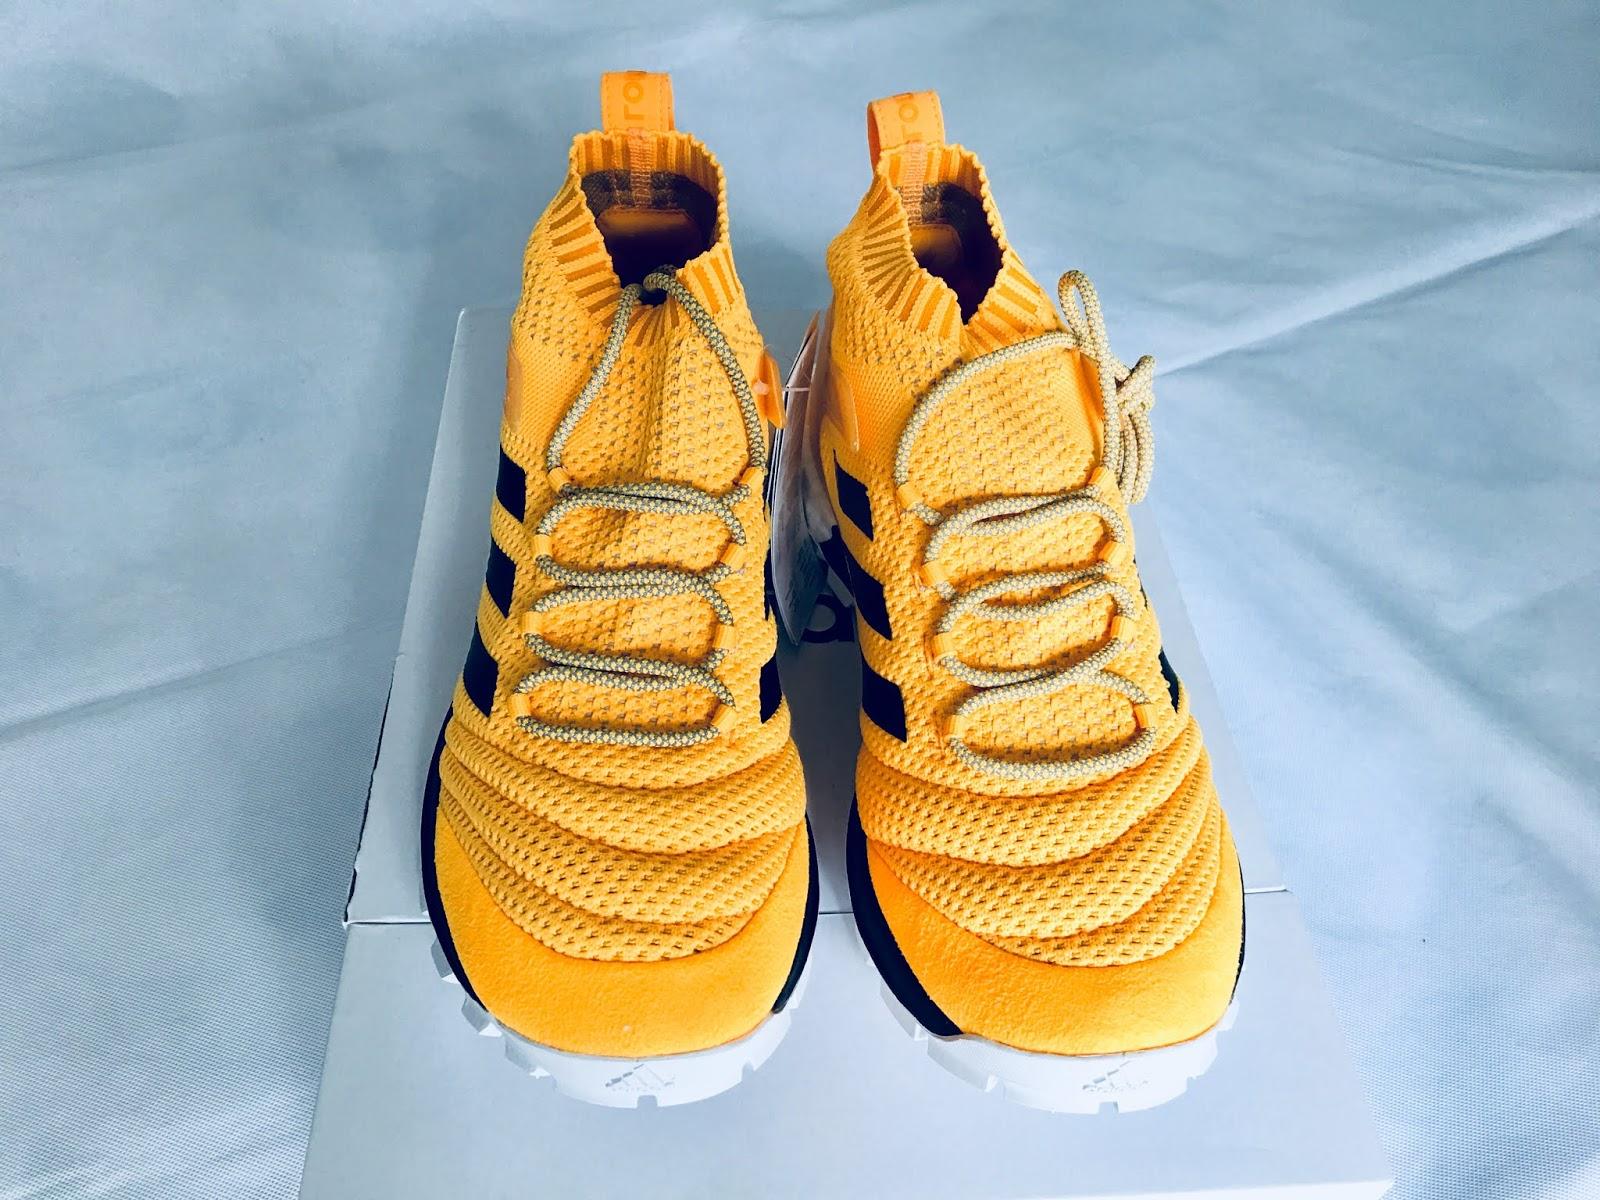 719caa8f4f4 Gosha Rubchinskiy x Adidas Copa PK Mid Orange Sneakers